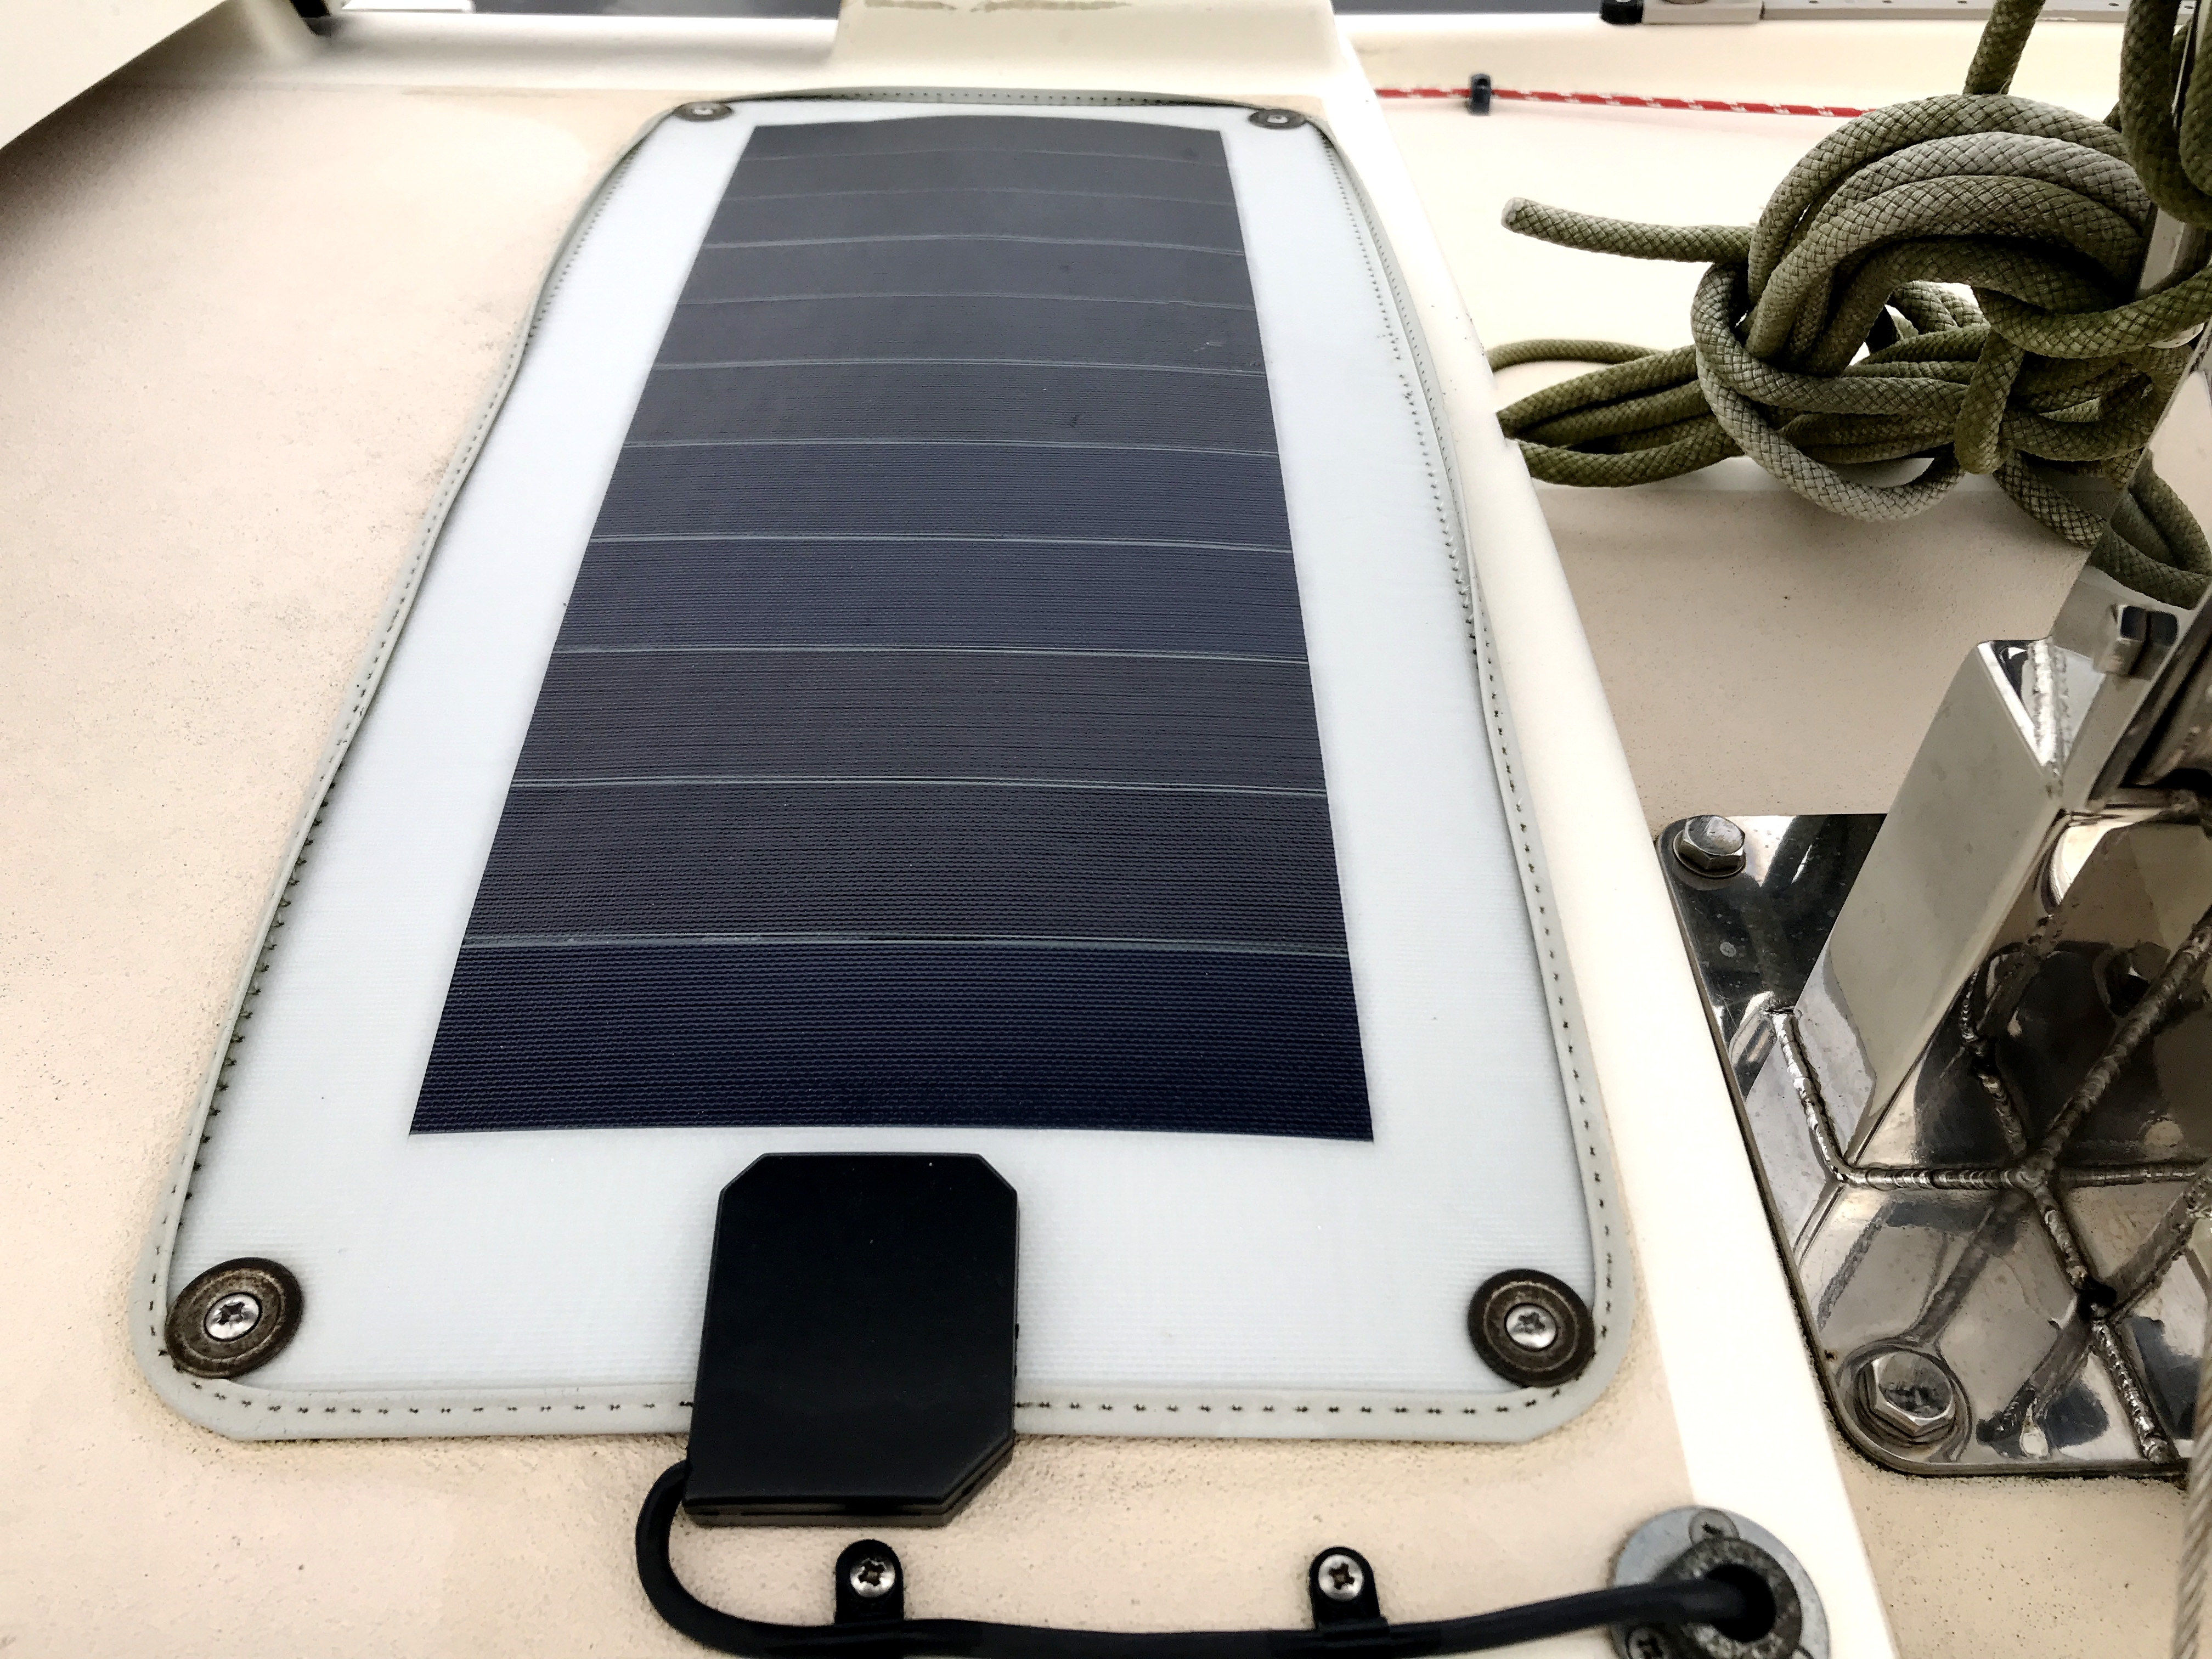 Cornish Crabbers Crabber 22 - solar battery charger